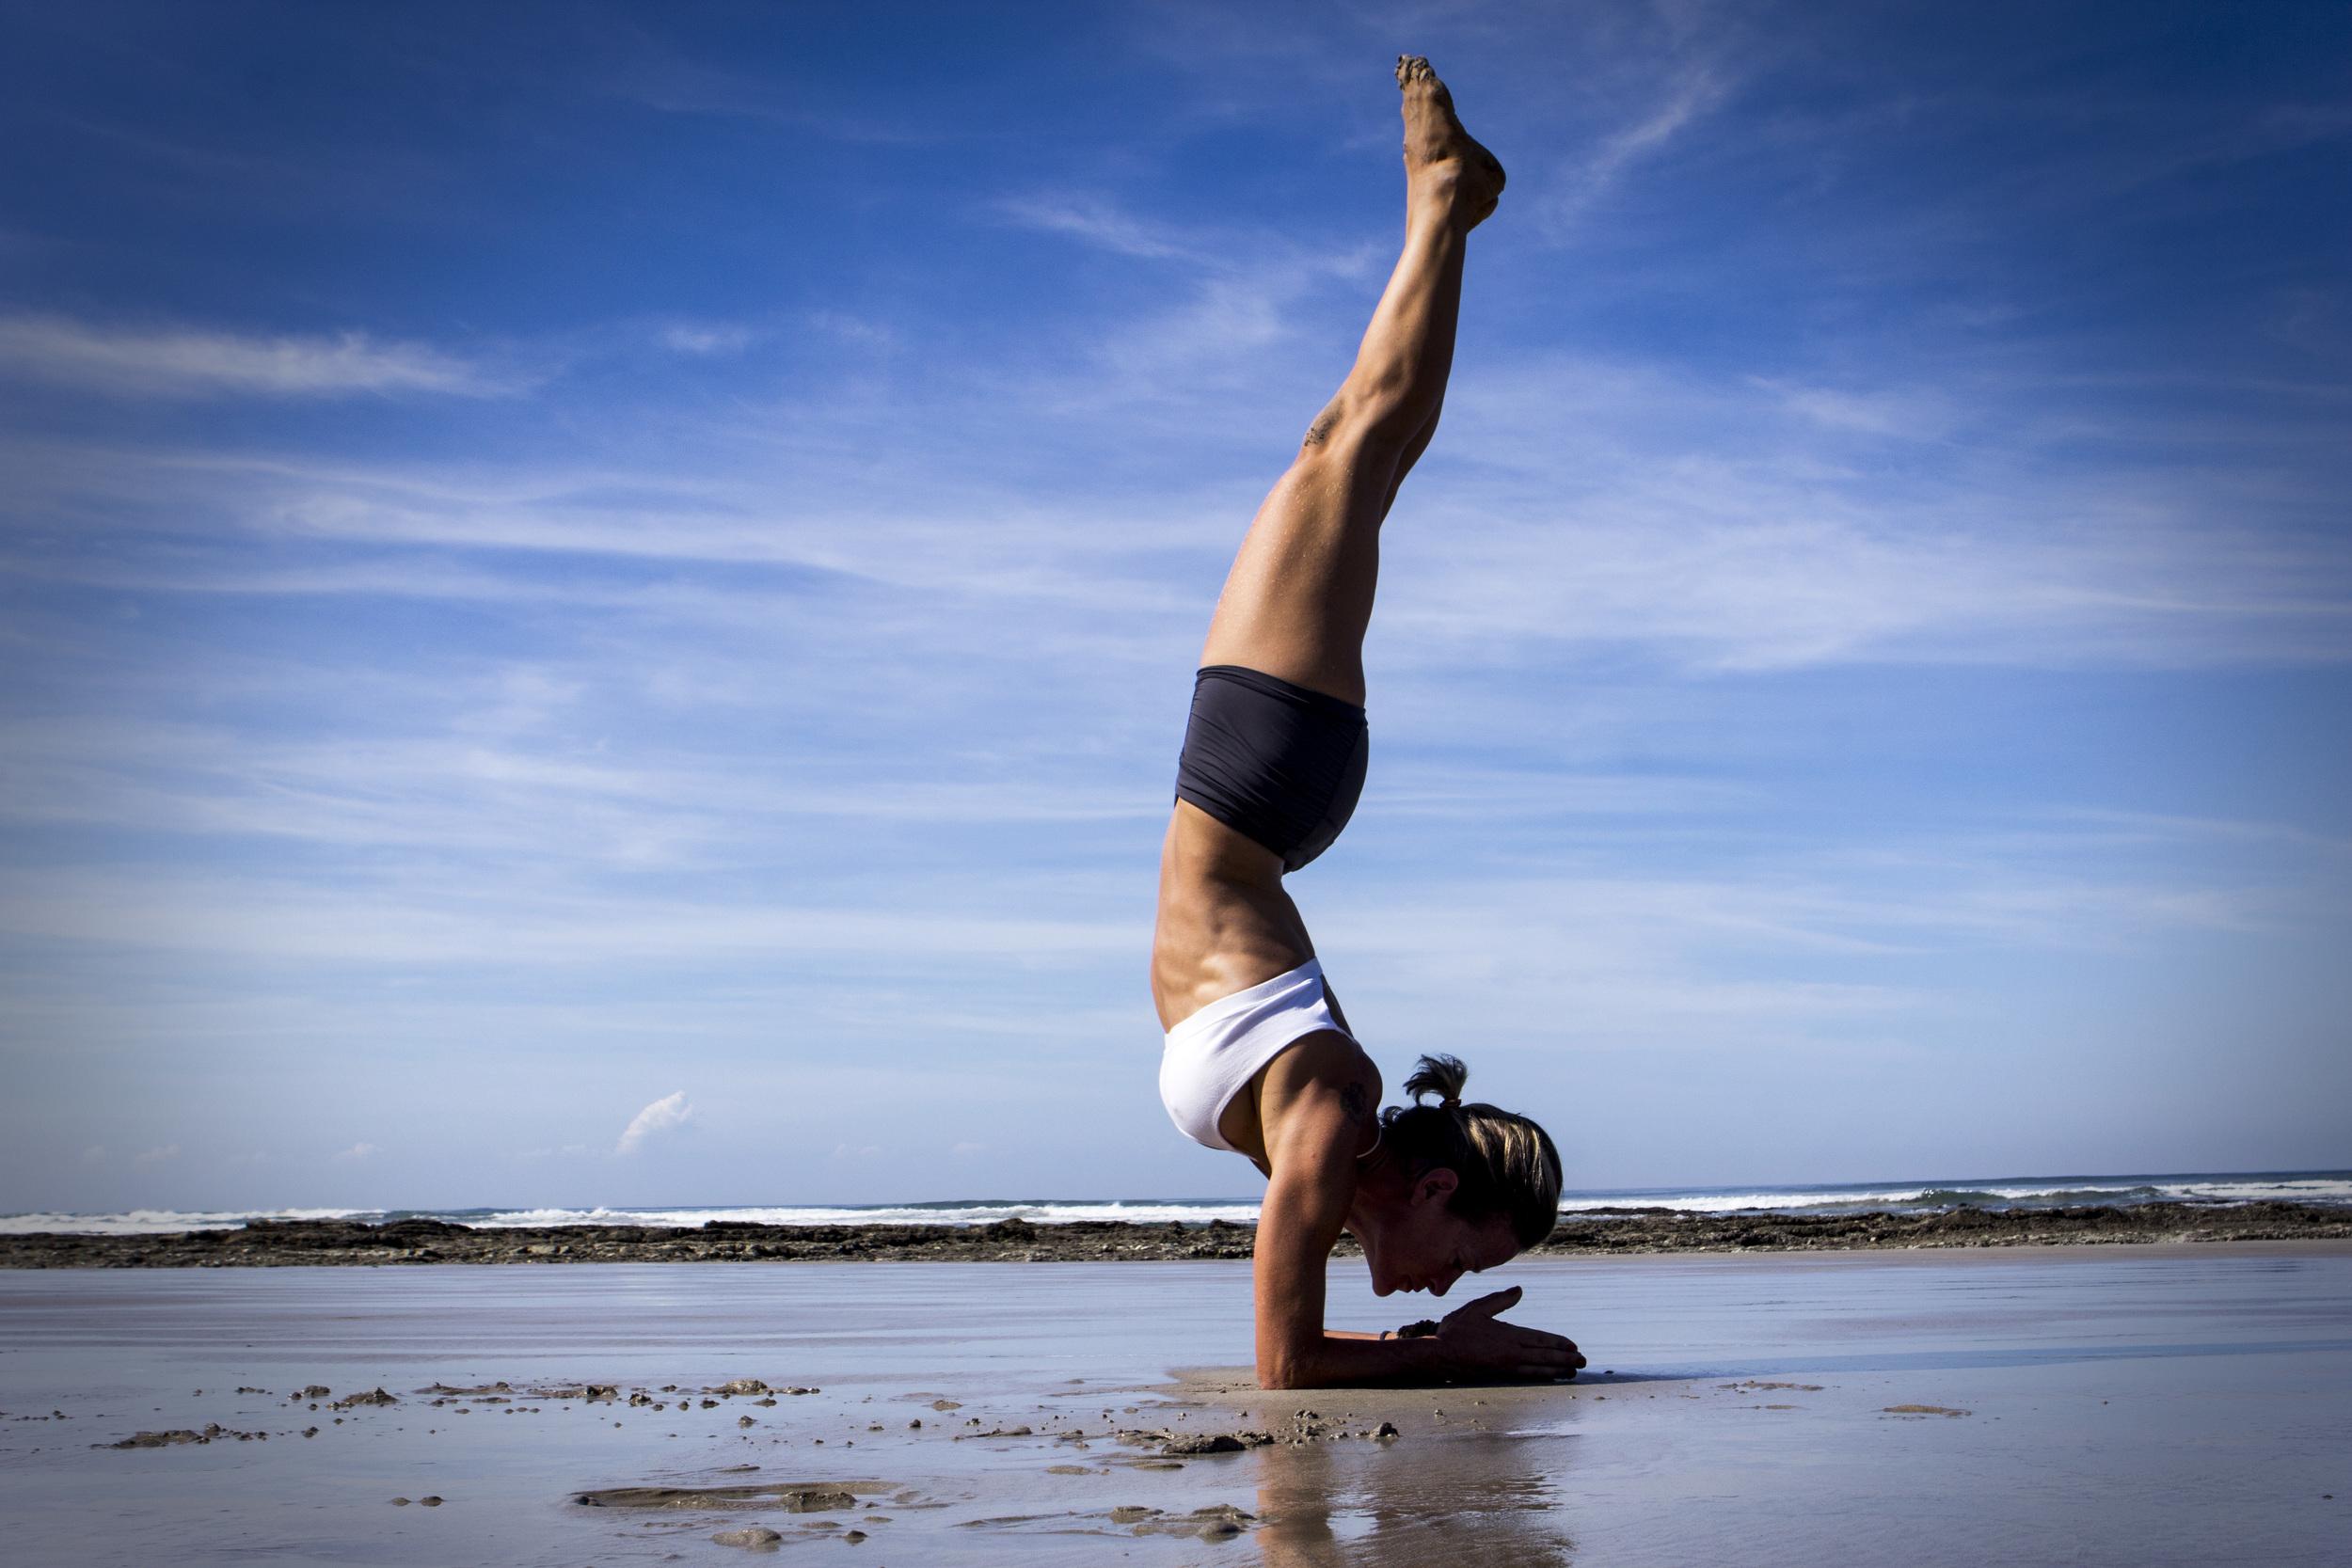 Maria Filippone, KOOSHOO Kindred Spirit and Yoga Teacher Extraordinaire